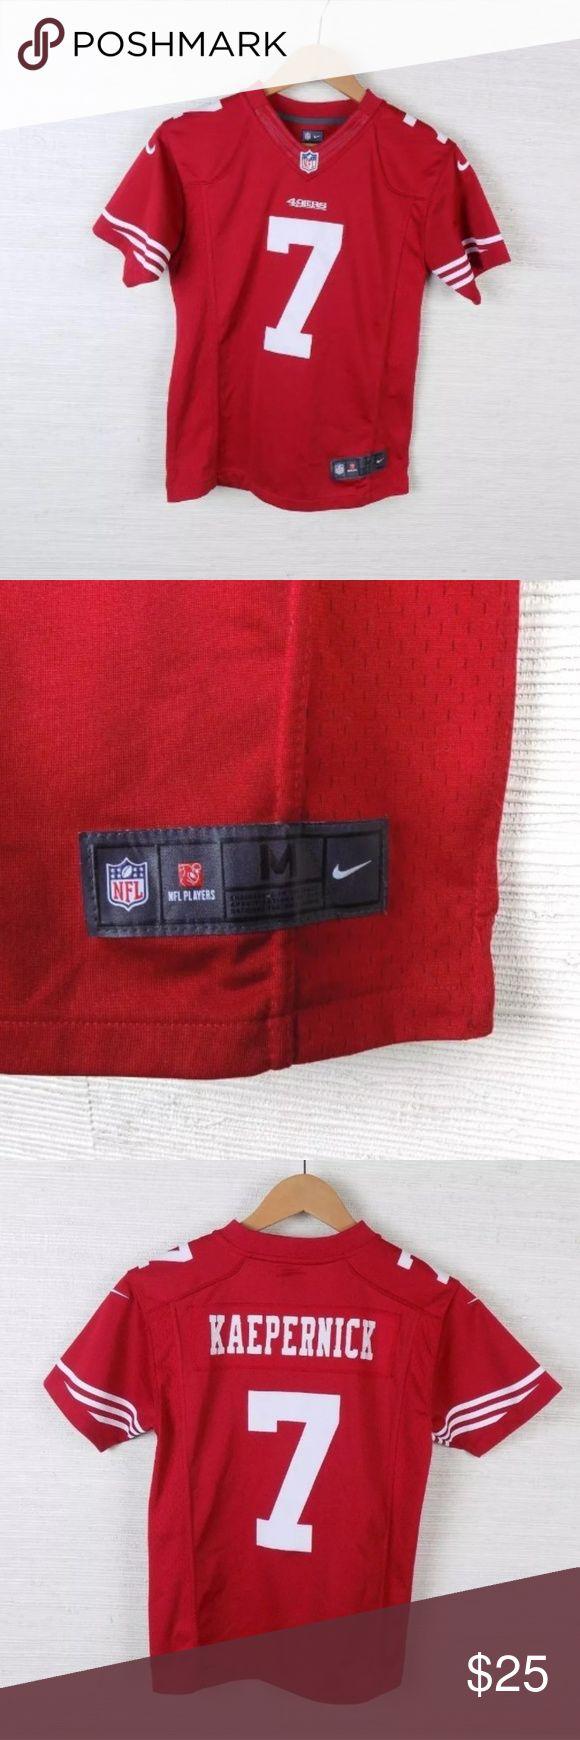 Colin Kaepernick Jersey San Francisco 49ers Kids Clothes